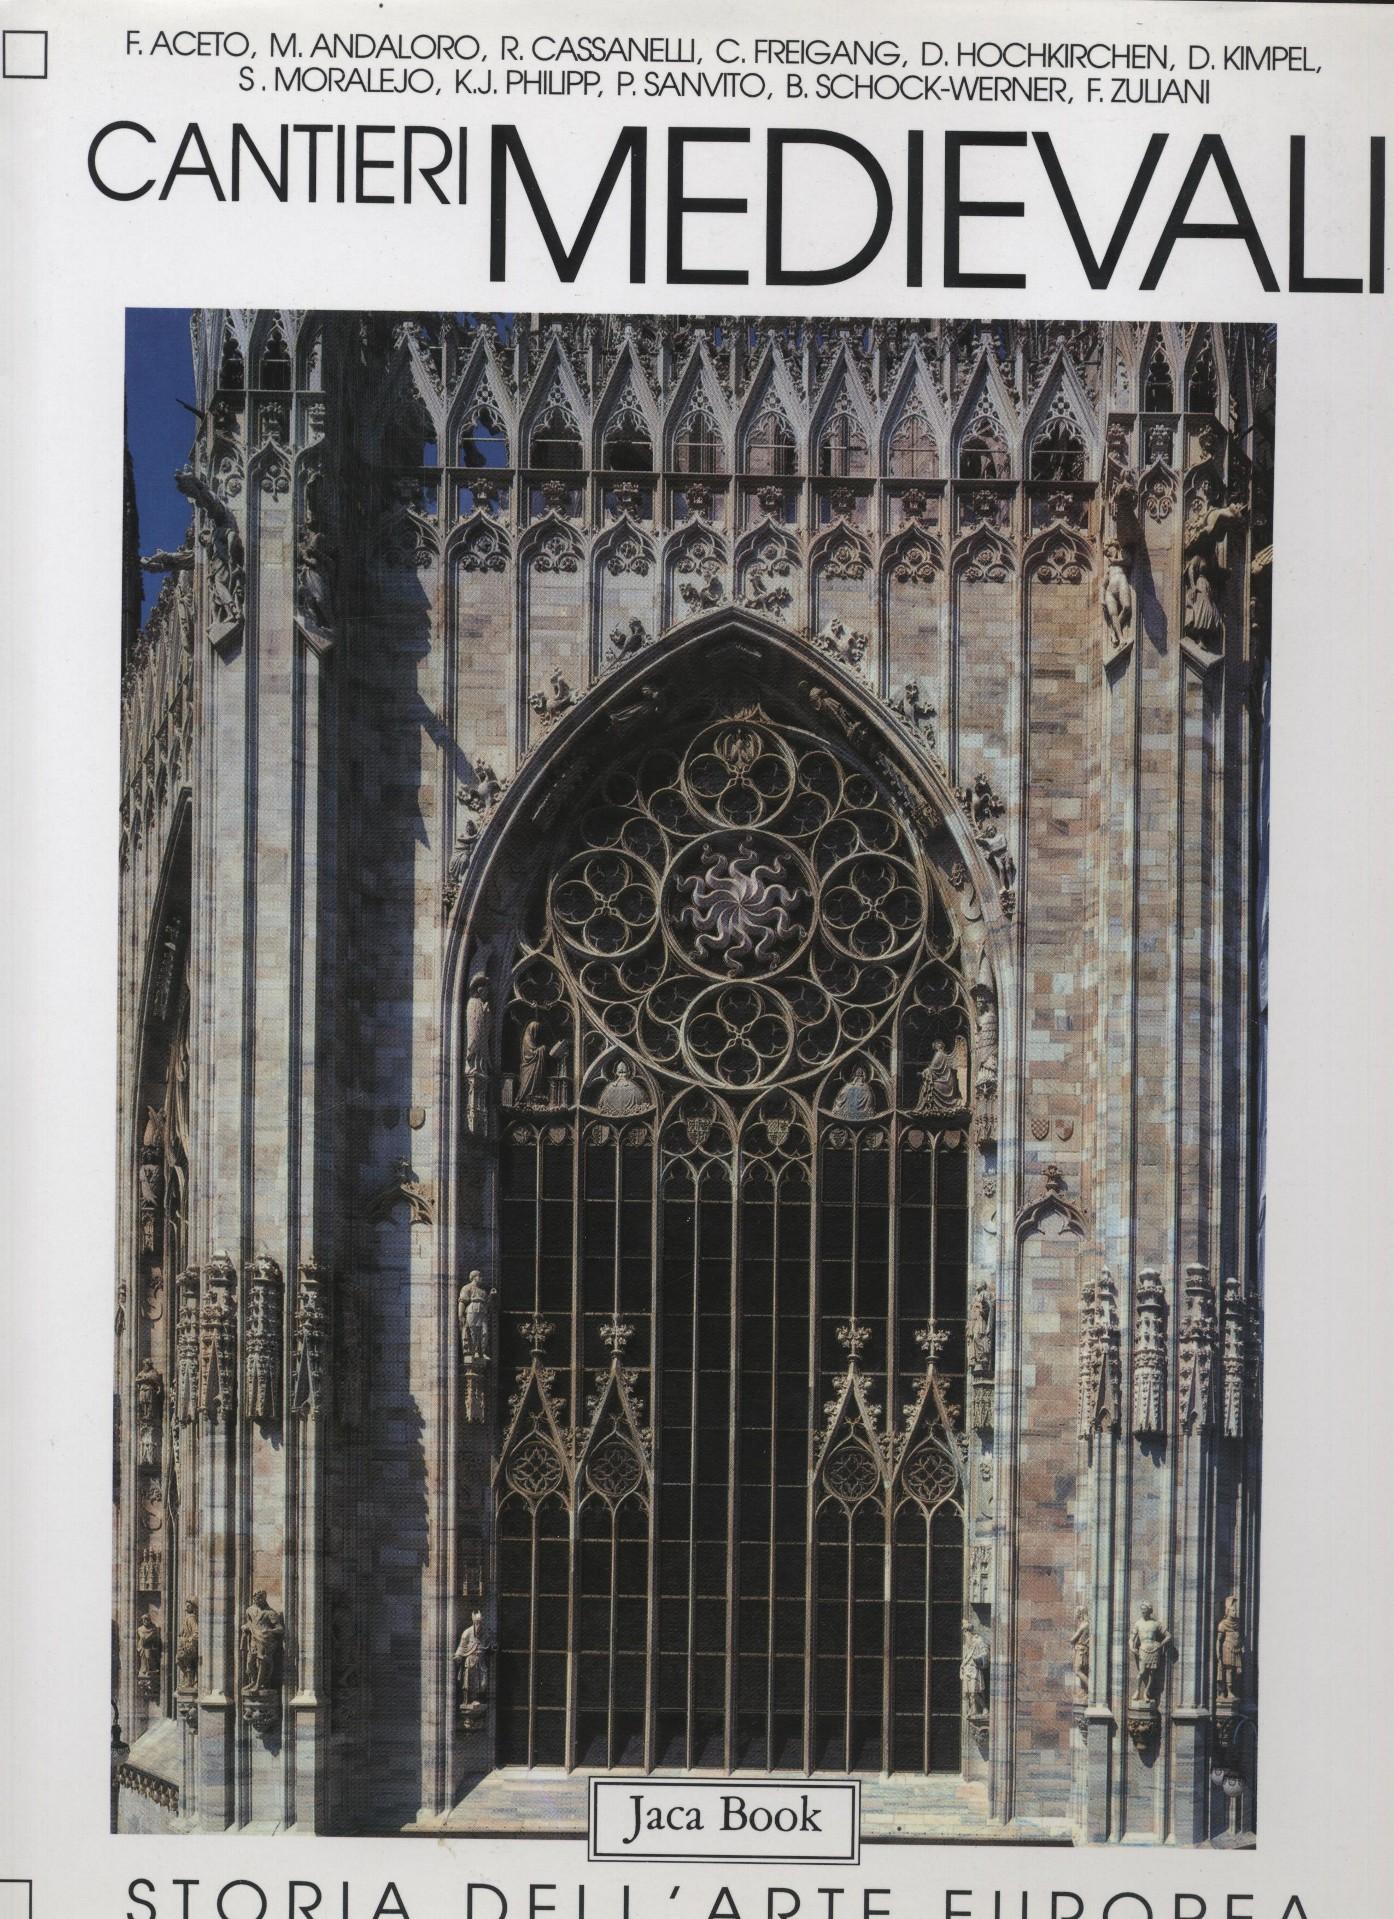 Cantieri medievali